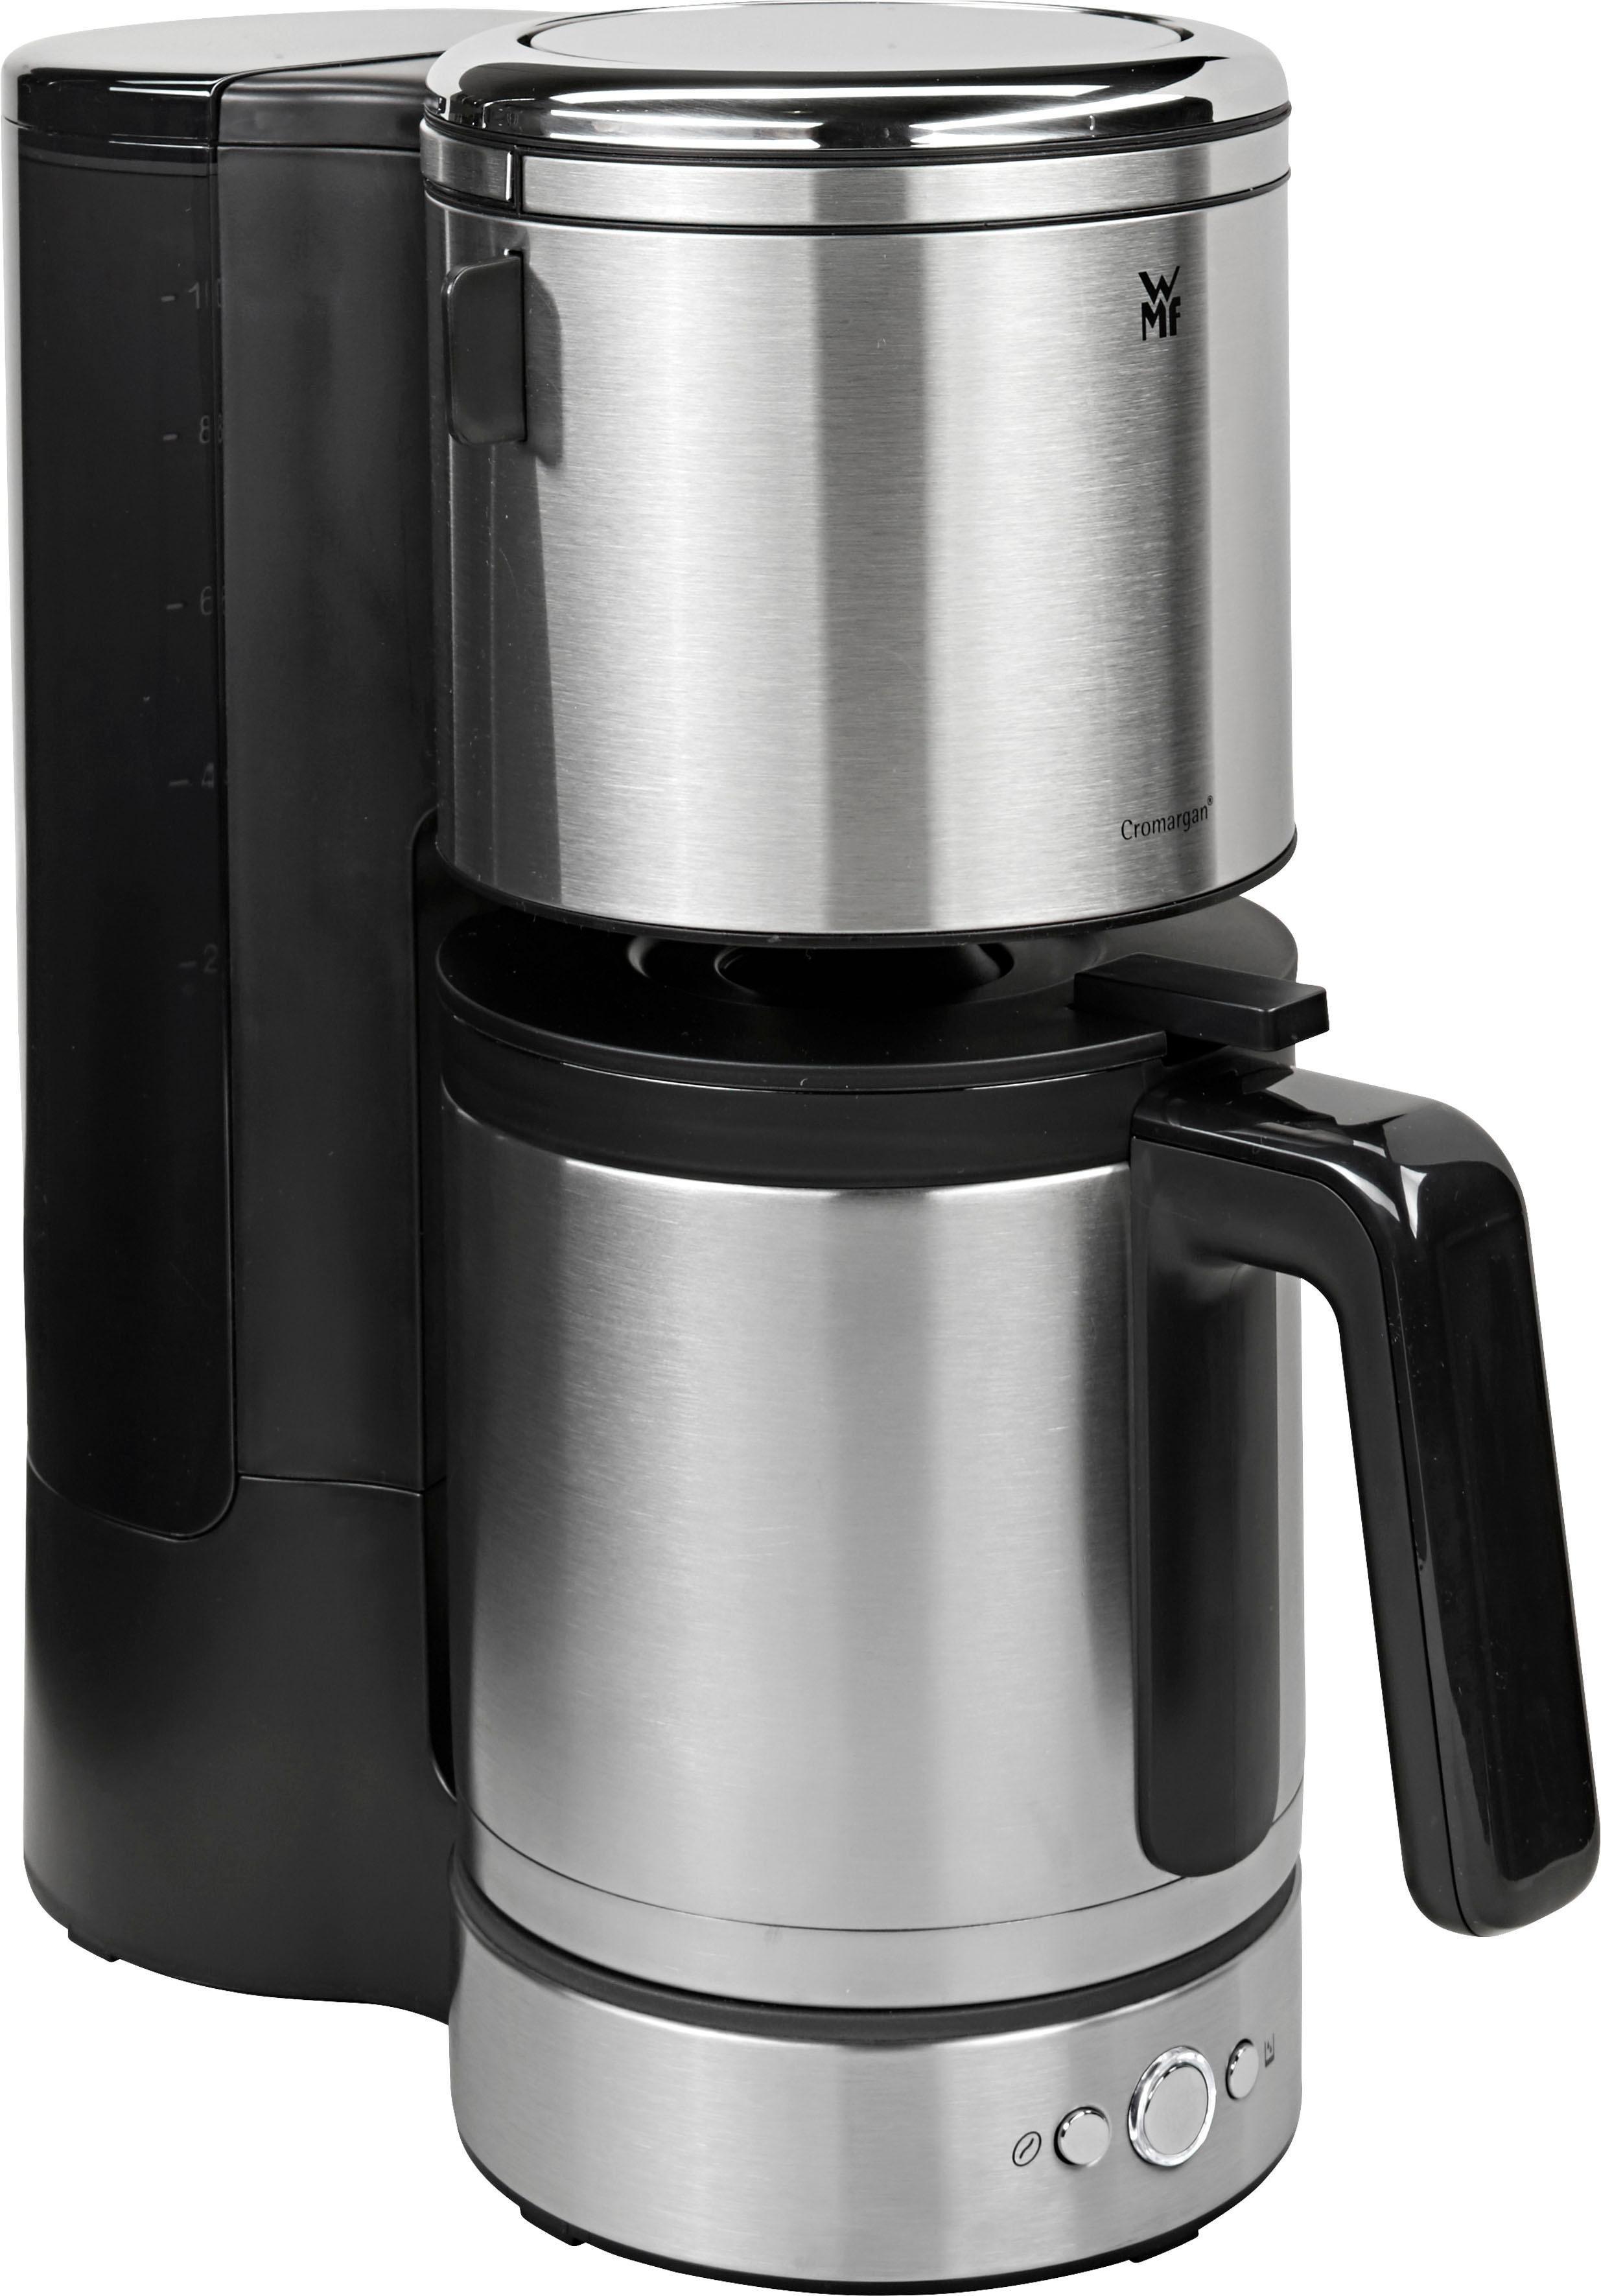 Filterkaffeemaschine LONO, 1,25l Kaffeekanne, Papierfilter, mit Thermokanne